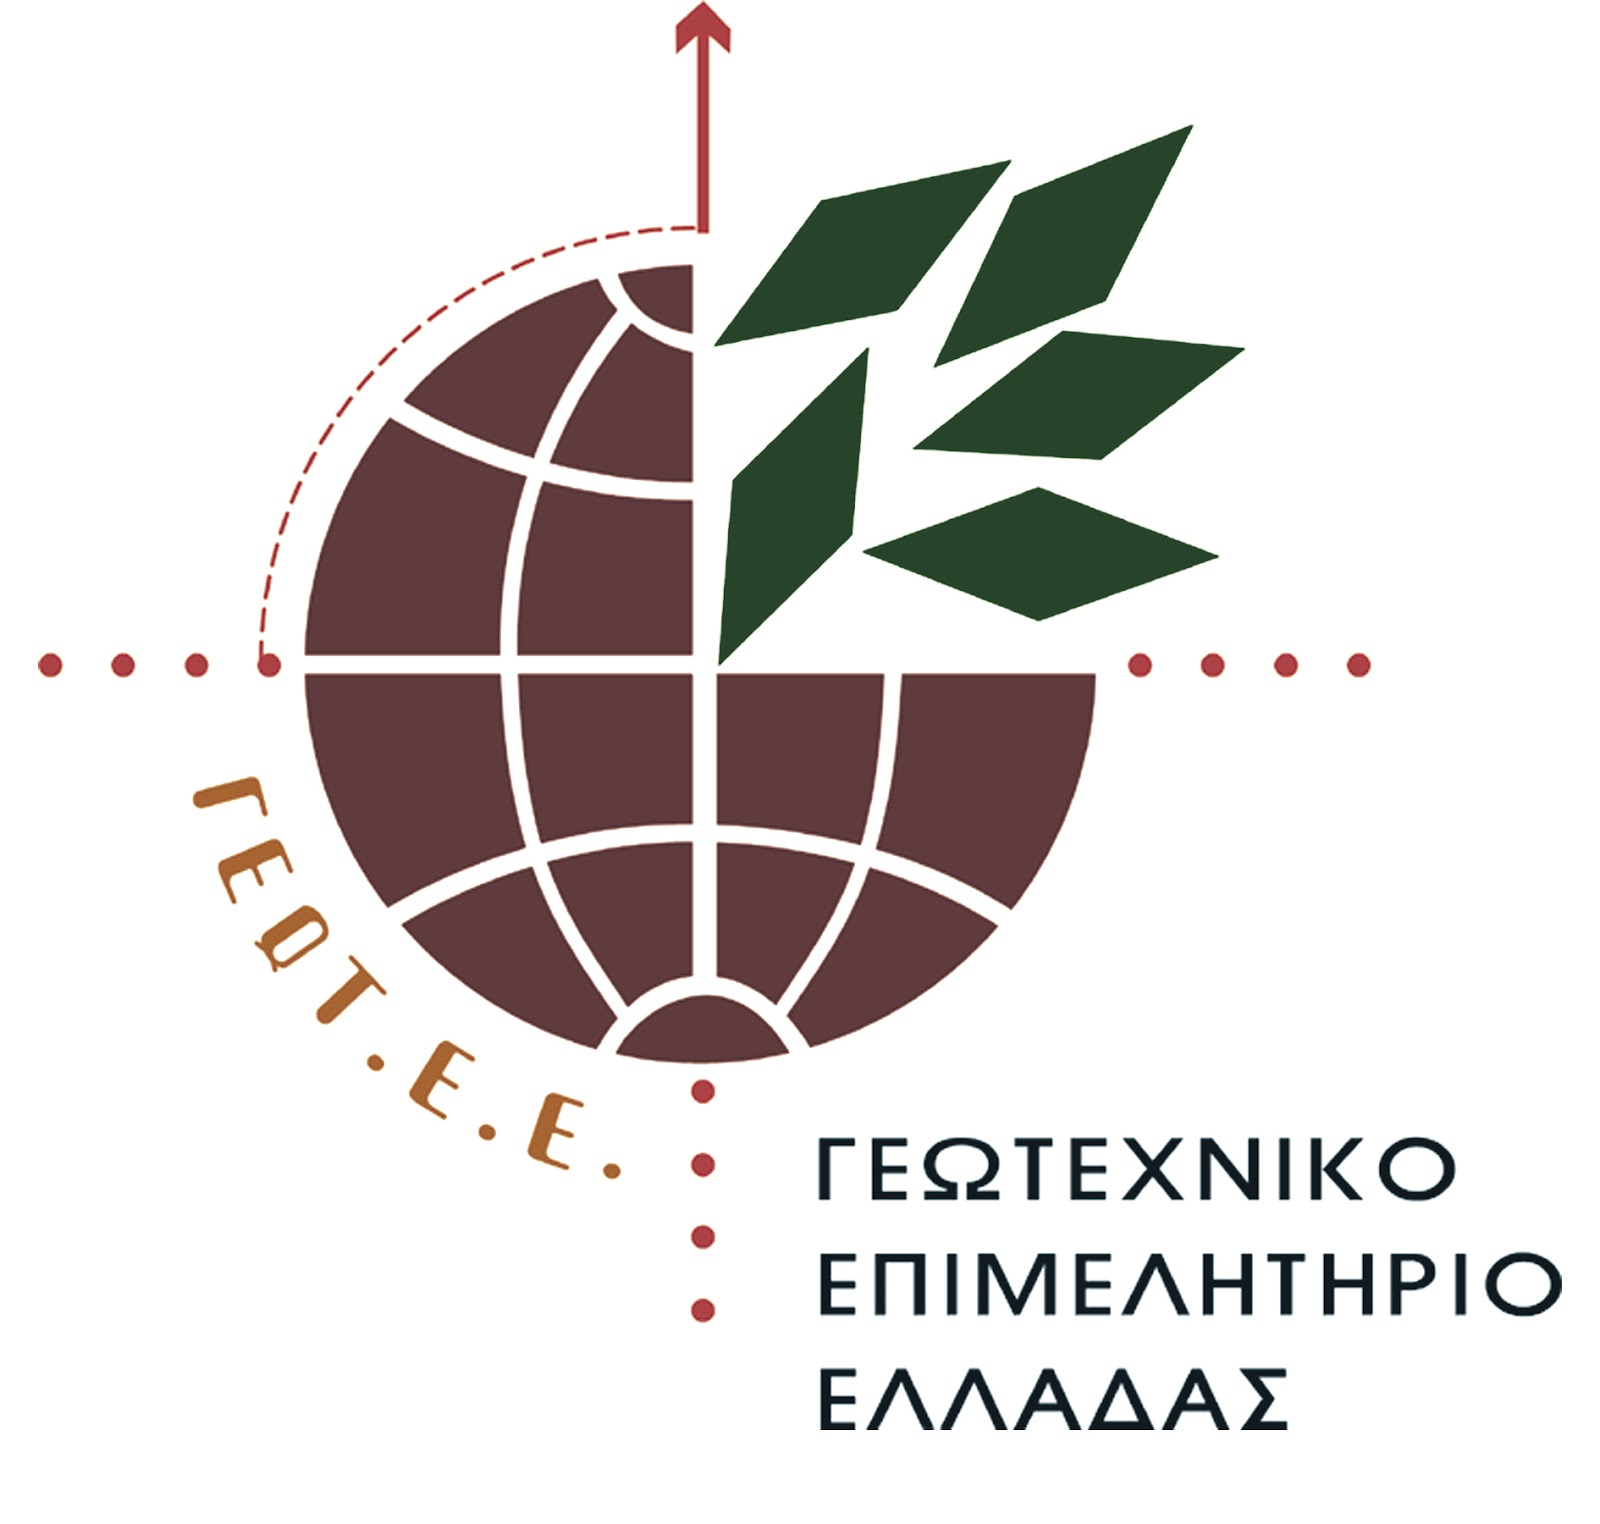 To ΓΕΩΤ.Ε.Ε./Π.Δυτικής Μακεδονίας για την έκδοση άδειας ίδρυσης καταφυγίου μικρών ζώων